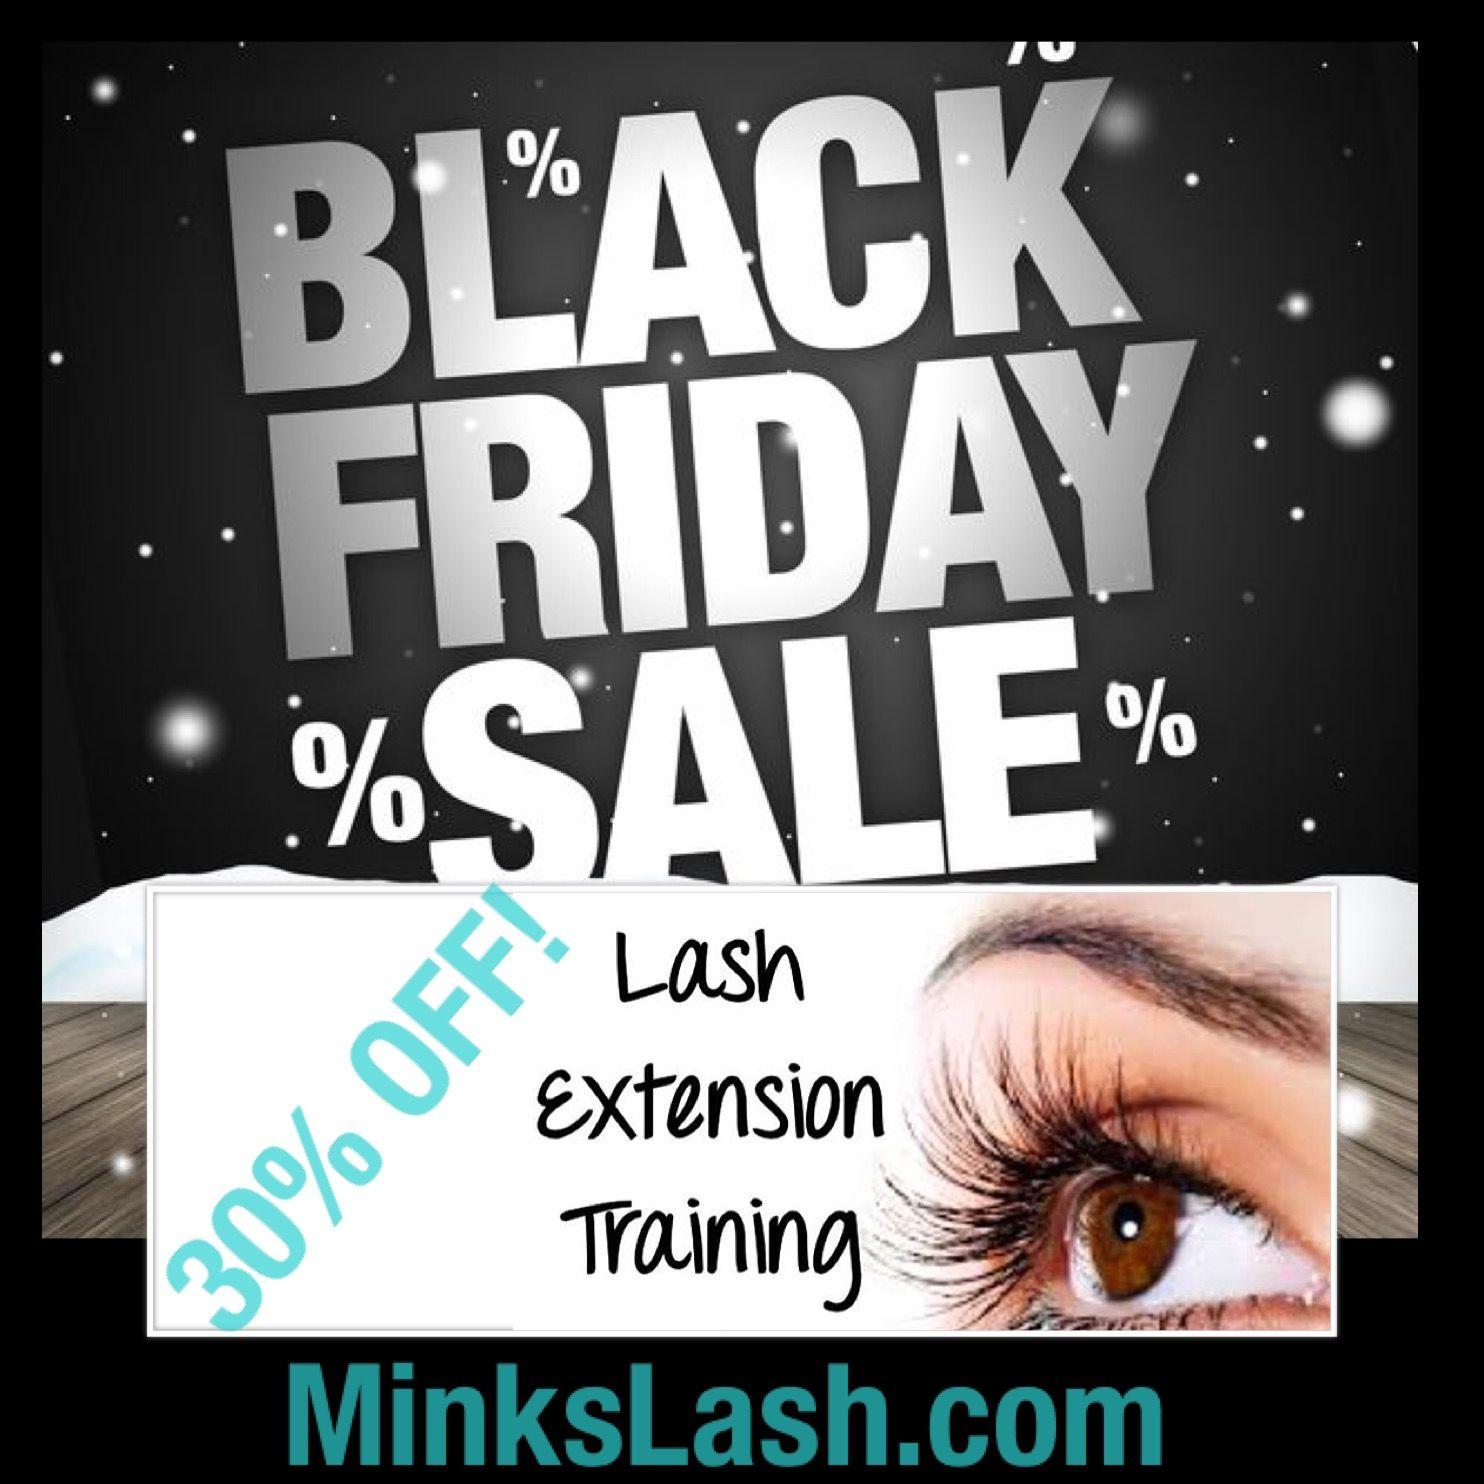 Black Friday Sale Save On Eyelash Extension Training In Atlanta